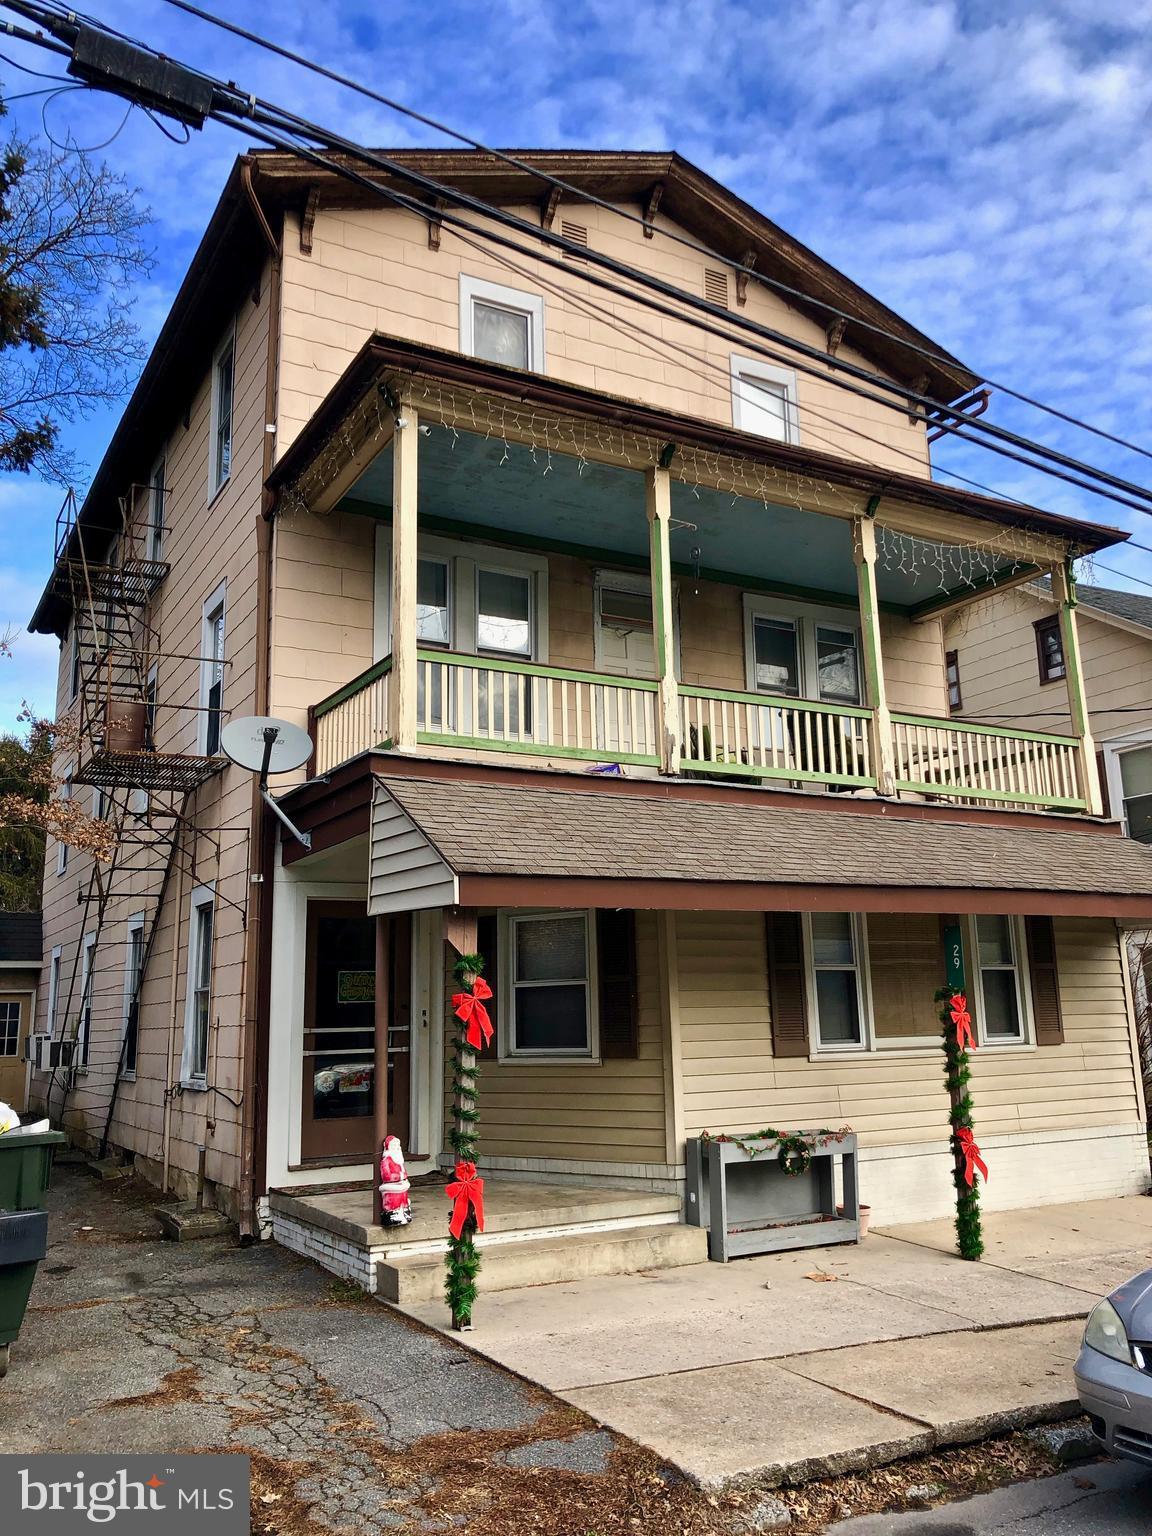 29 E MAIN STREET, BROWNSTOWN, PA 17508